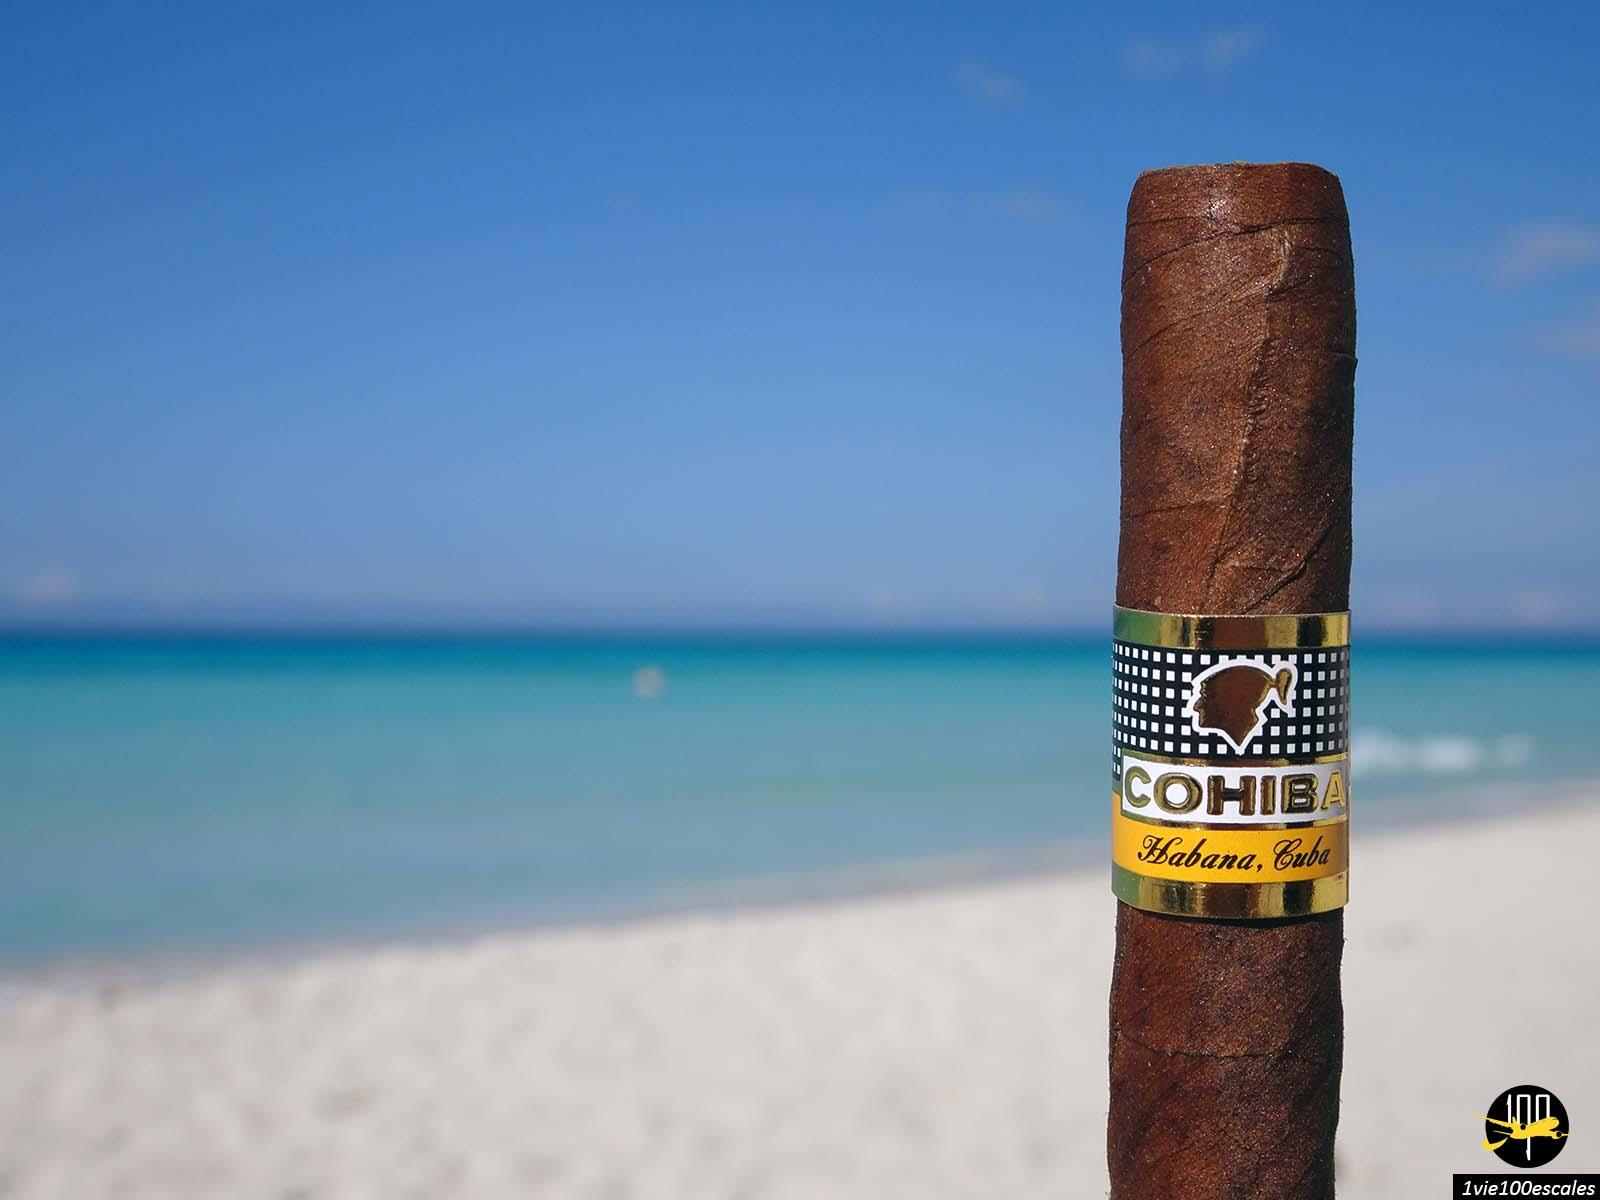 Le fameux cigare cubain le Cohiba Habana Cuba sur la plage de Varadero